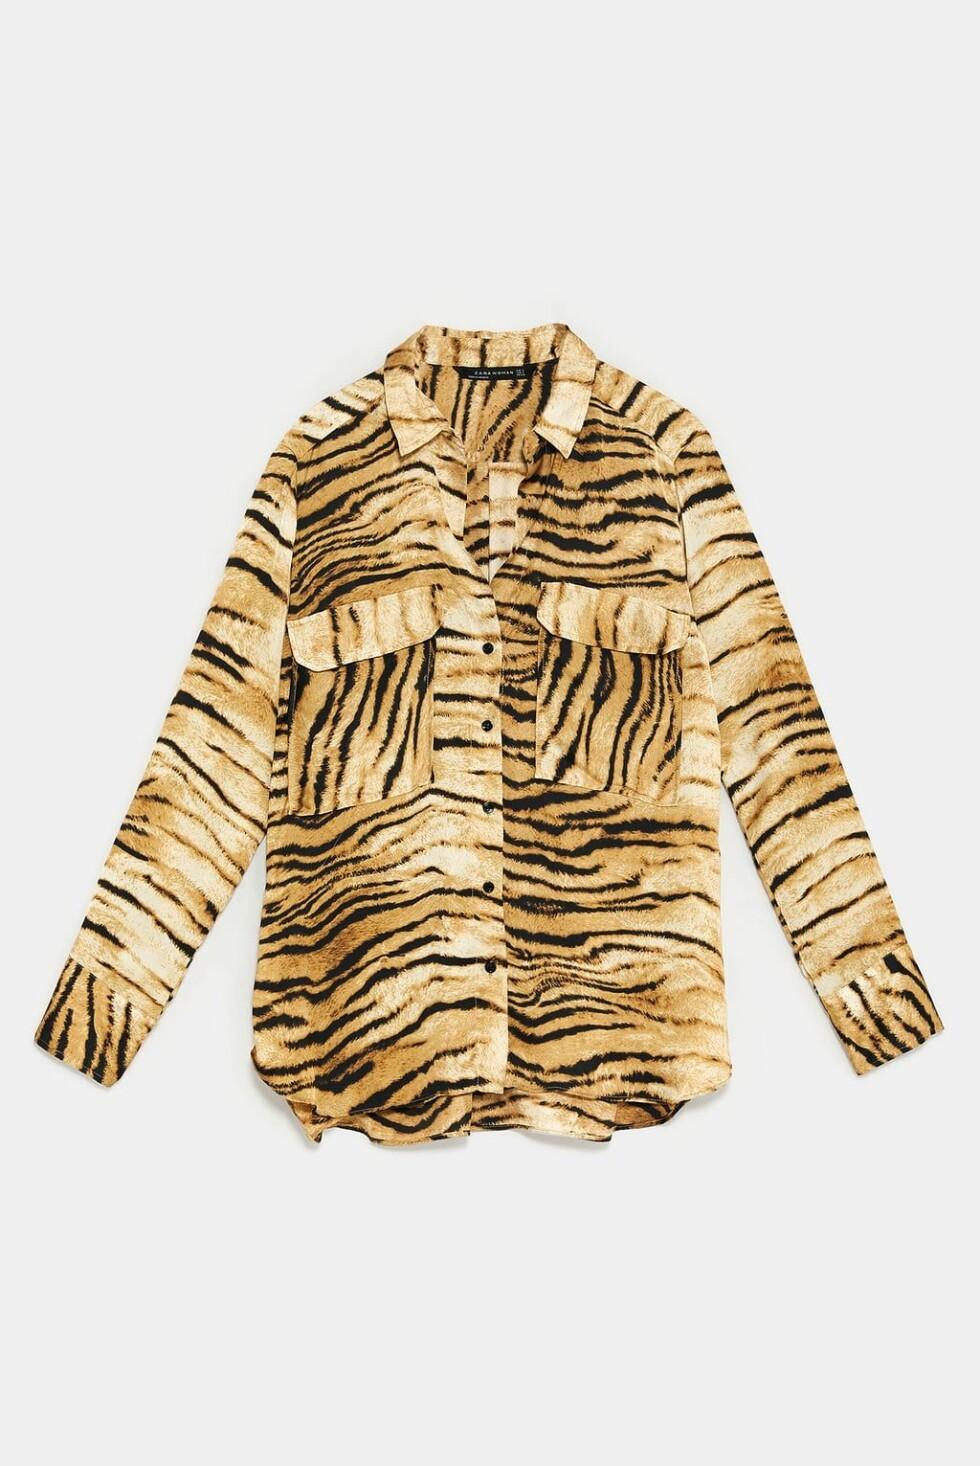 Skjorte fra Zara |399,-| https://www.zara.com/no/no/bluse-med-dyrem%C3%B8nster-p07690942.html?v1=8381532&v2=1074660